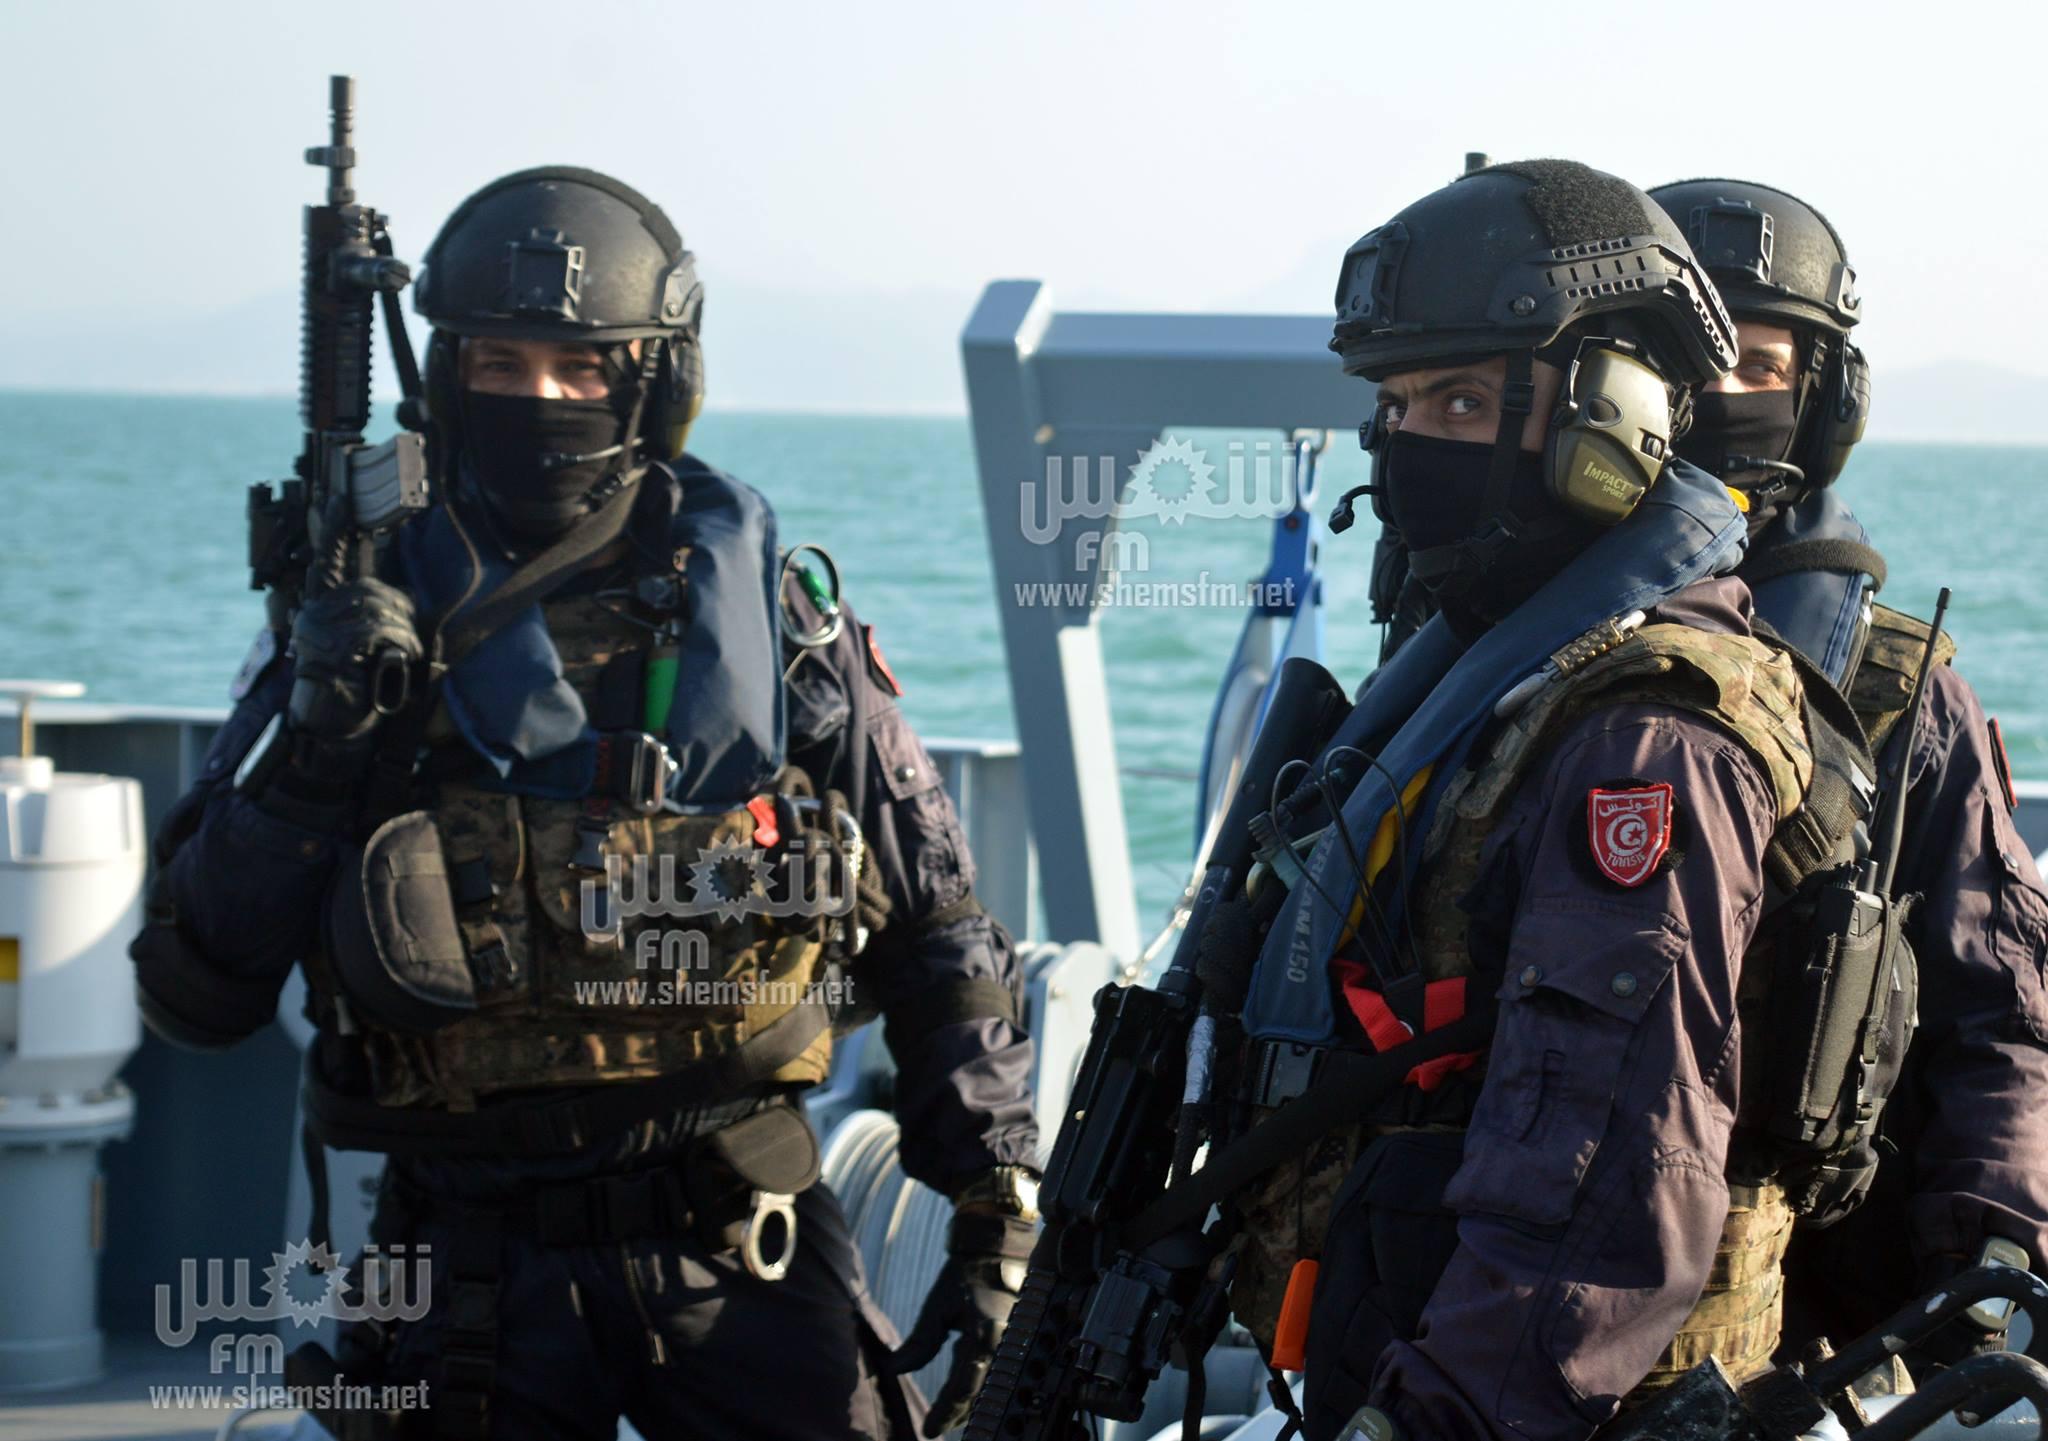 Armée Tunisienne / Tunisian Armed Forces / القوات المسلحة التونسية - Page 16 57343400-2455595757795028-3948550523988213760-o